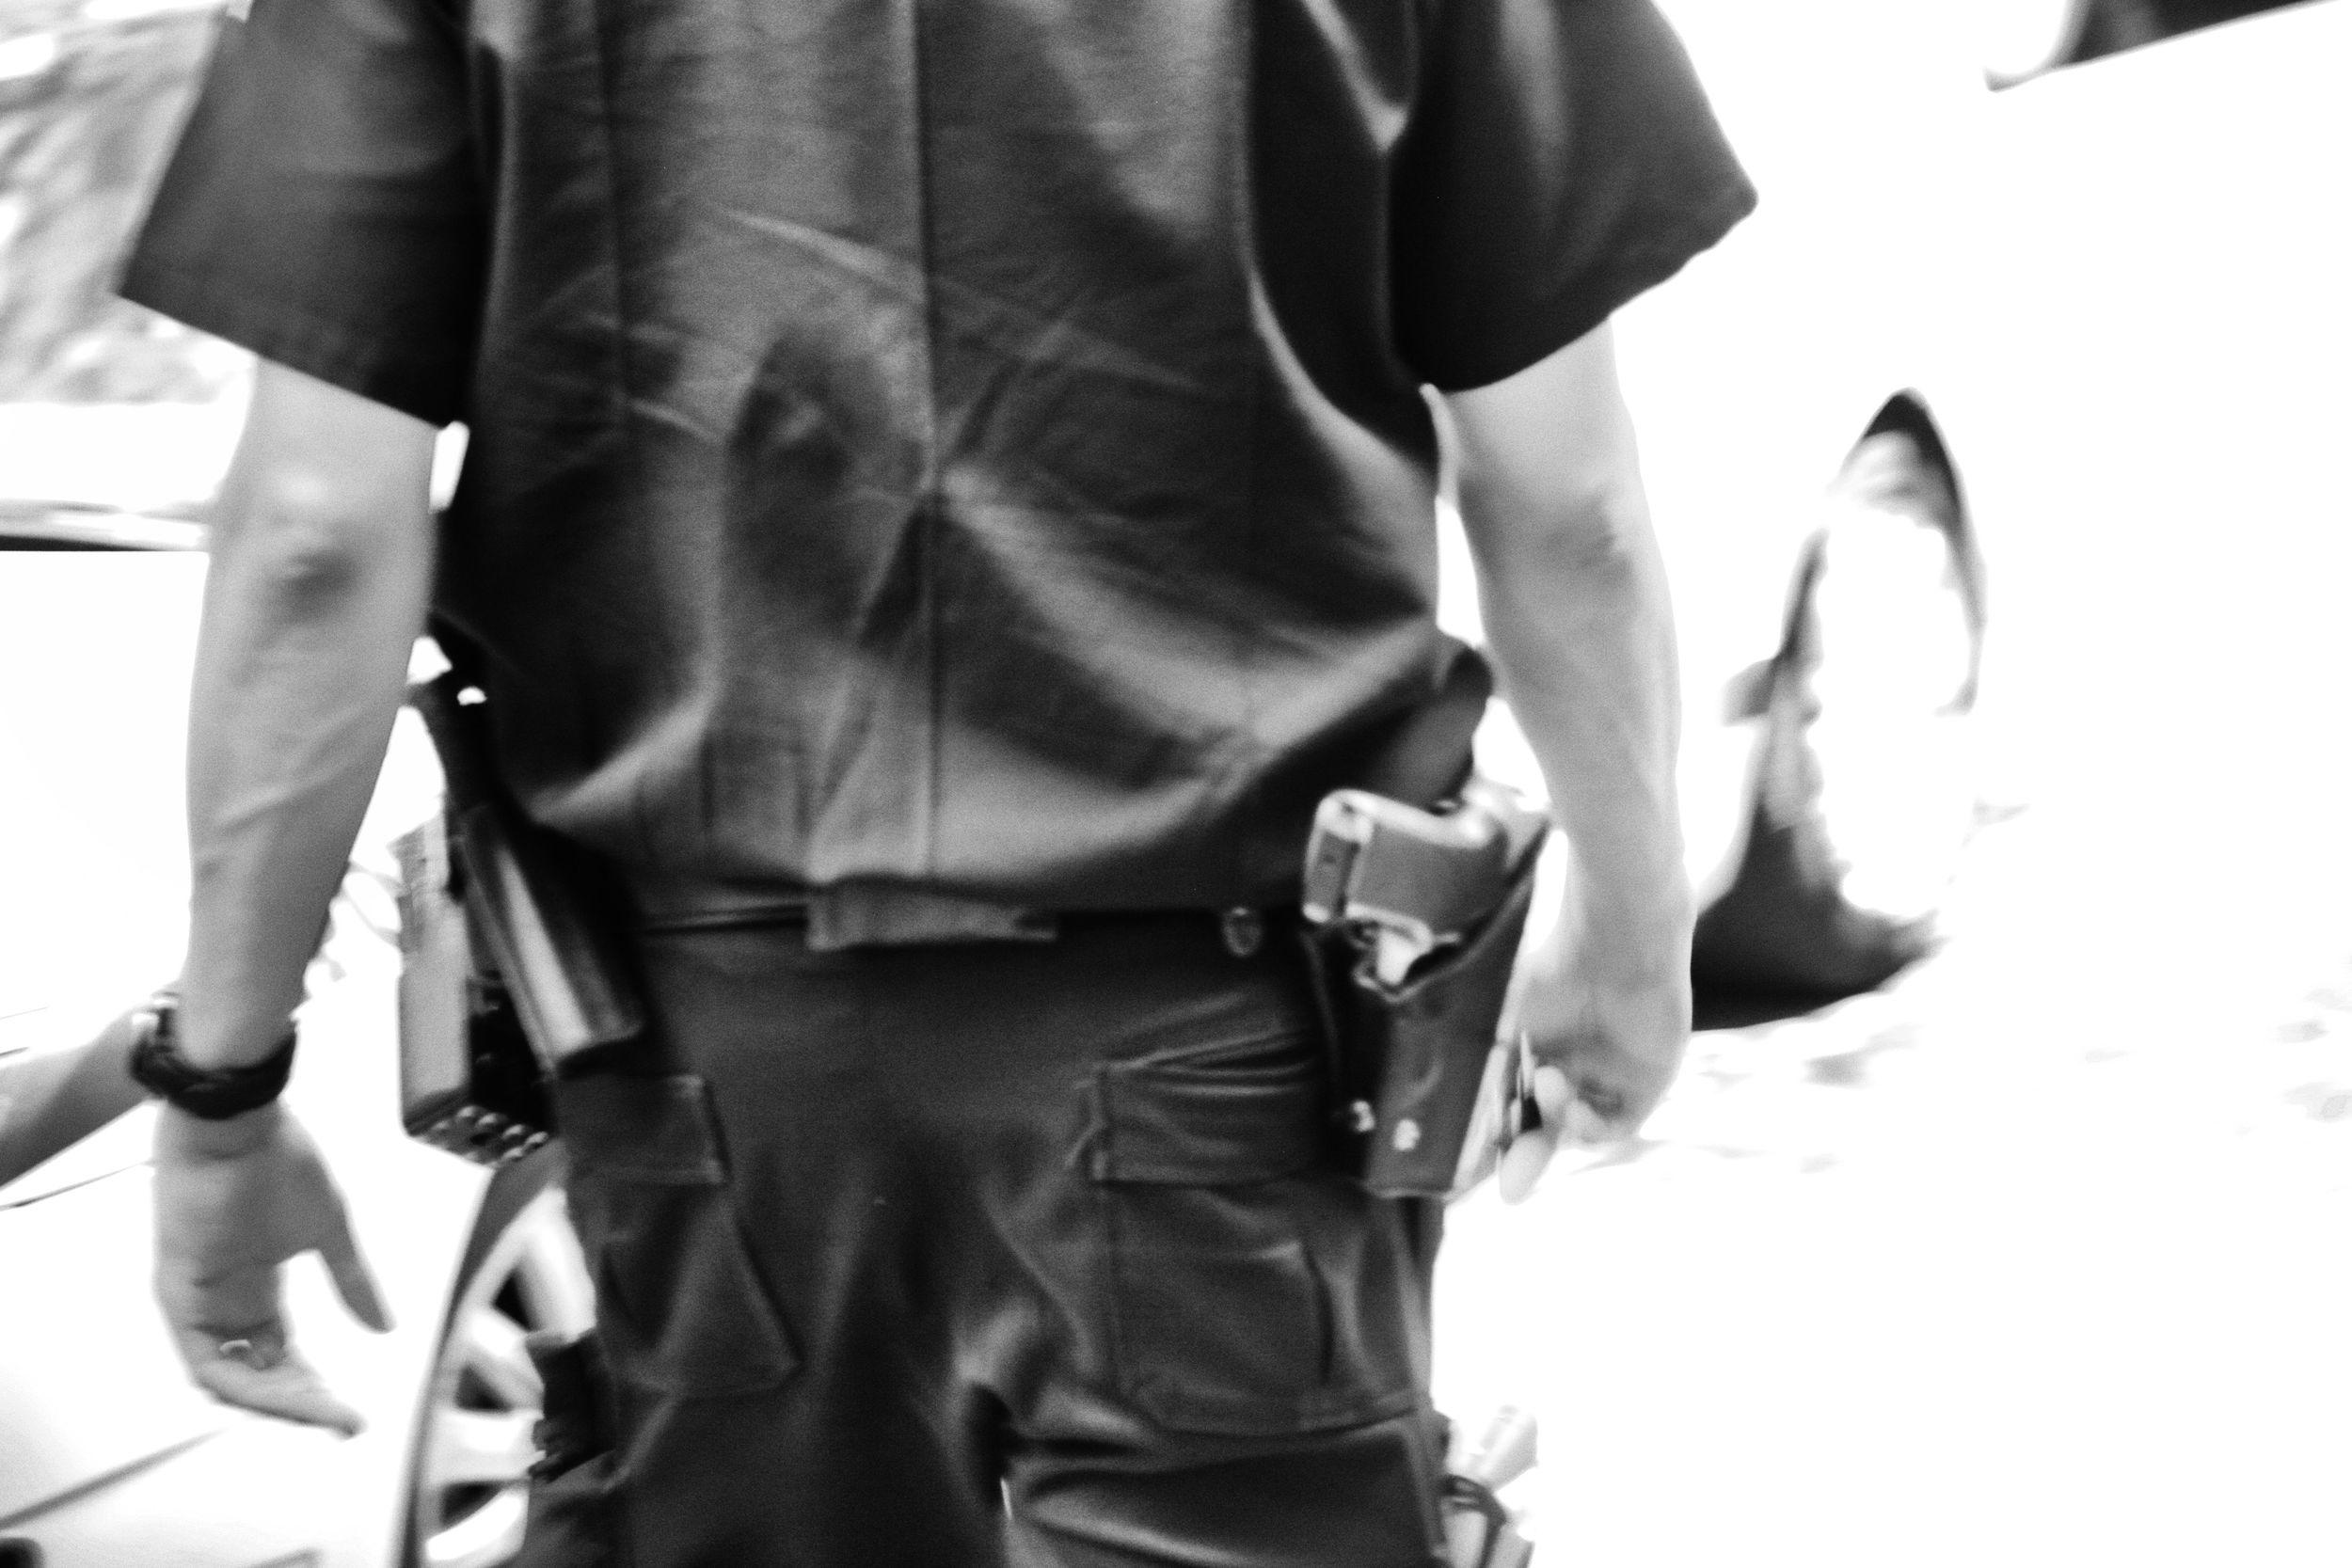 copback1.JPG